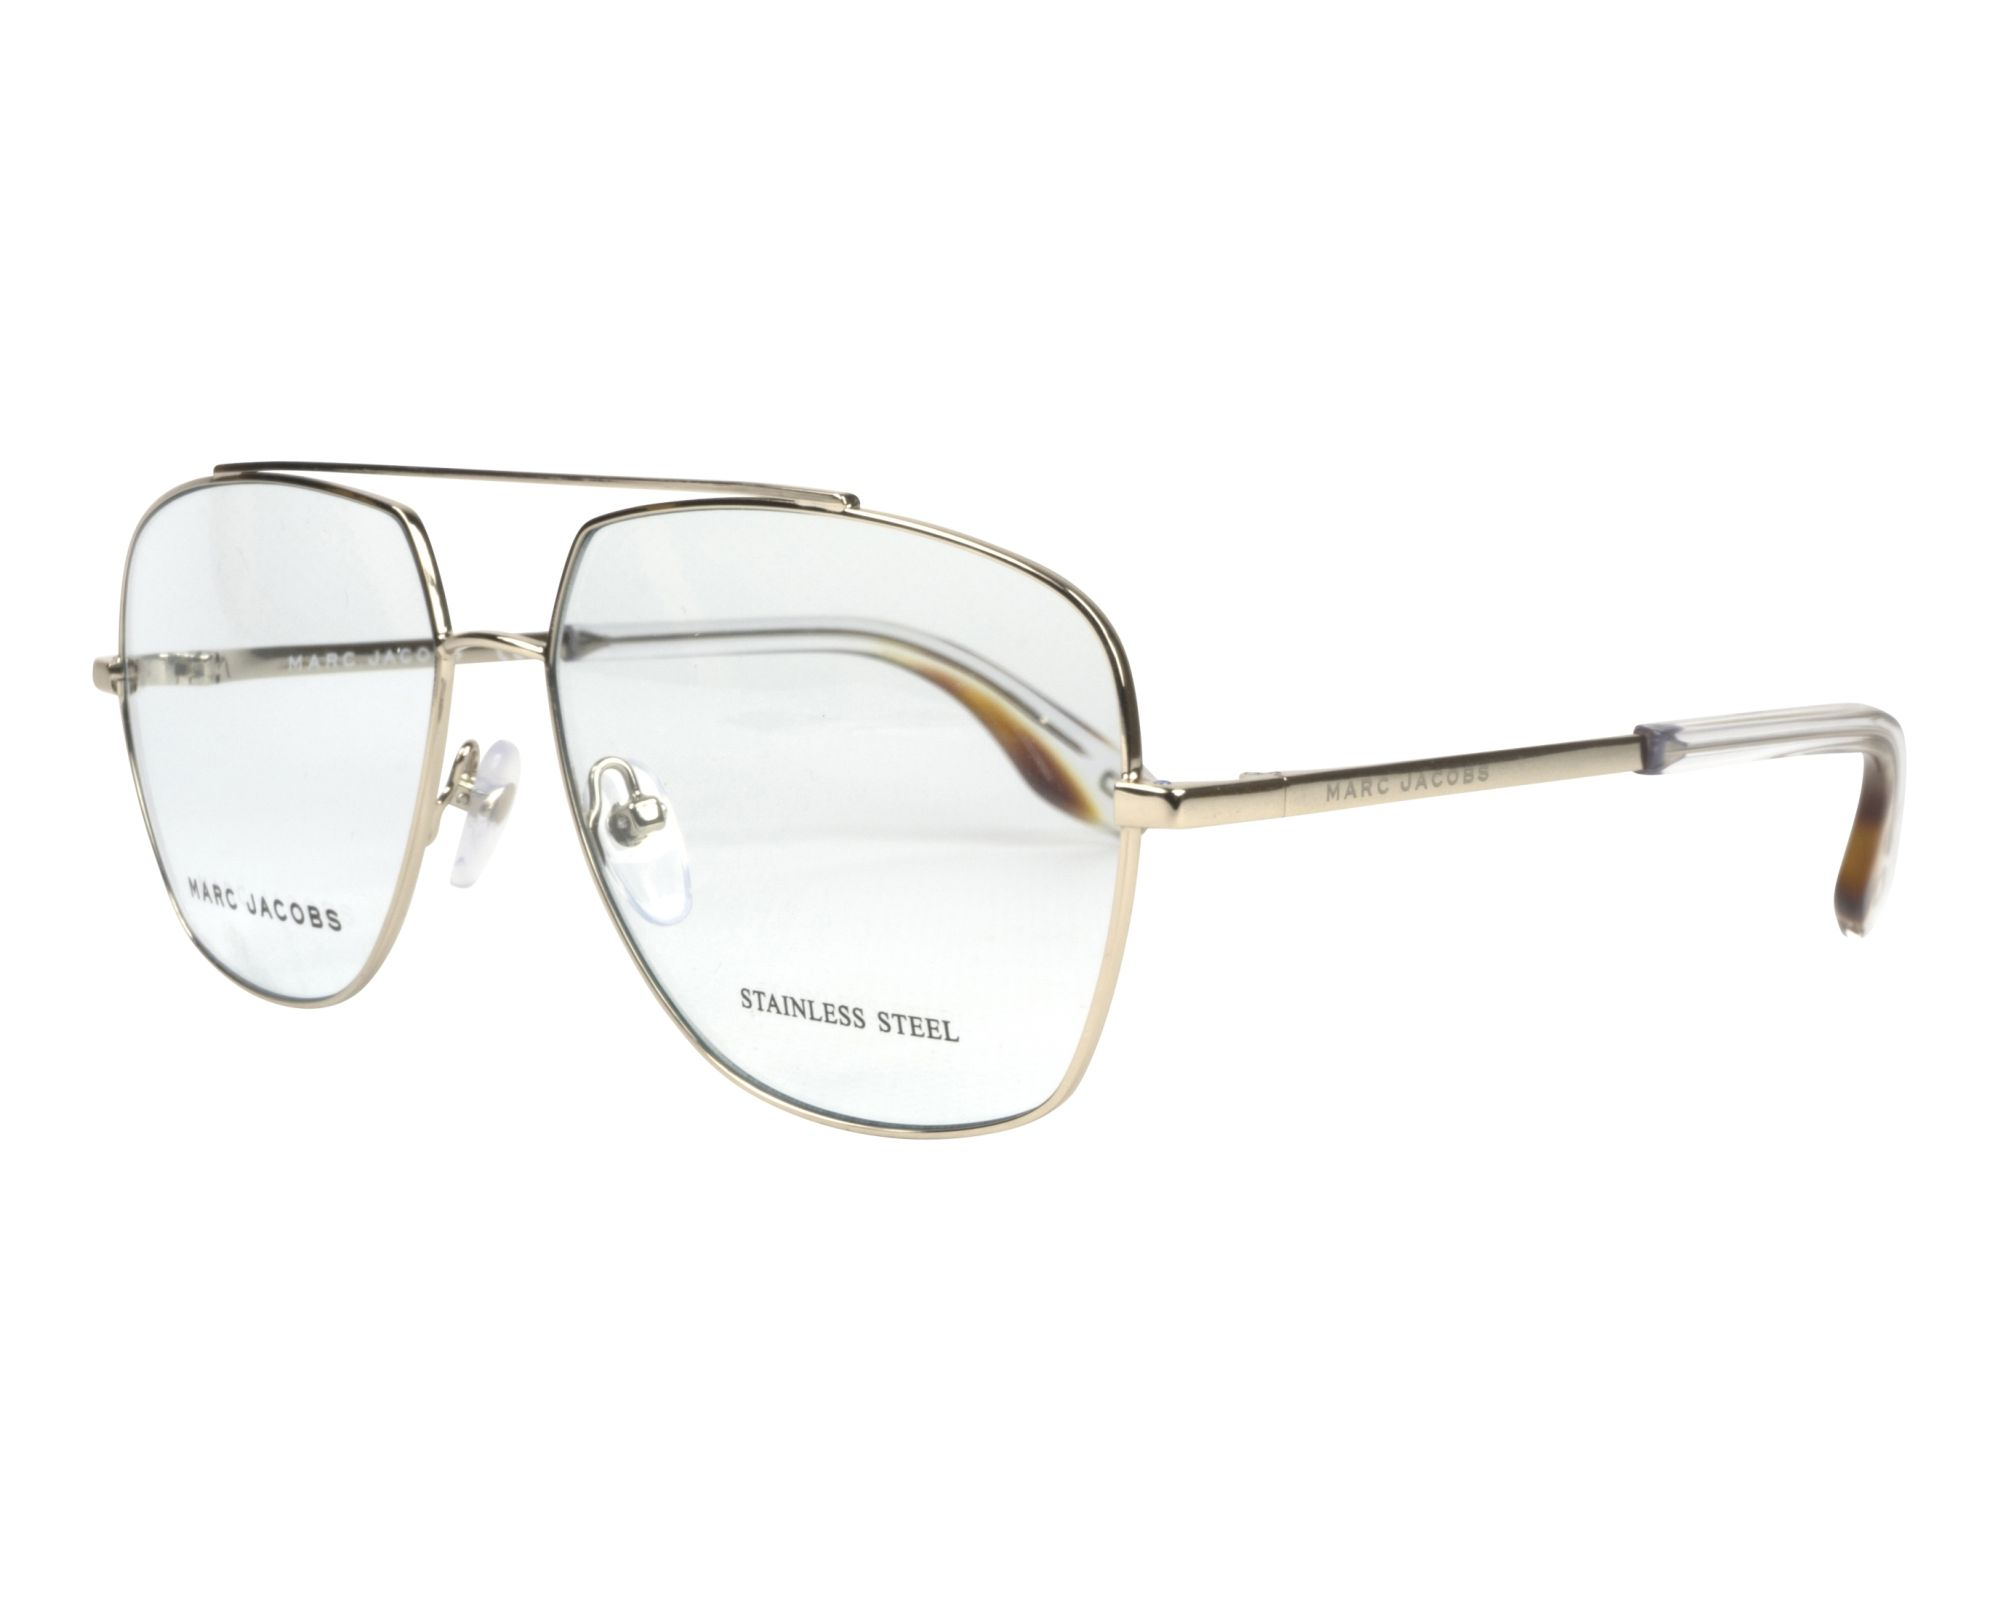 Marc Jacobs Brille MARC-271 3YG Silber - Gläser: